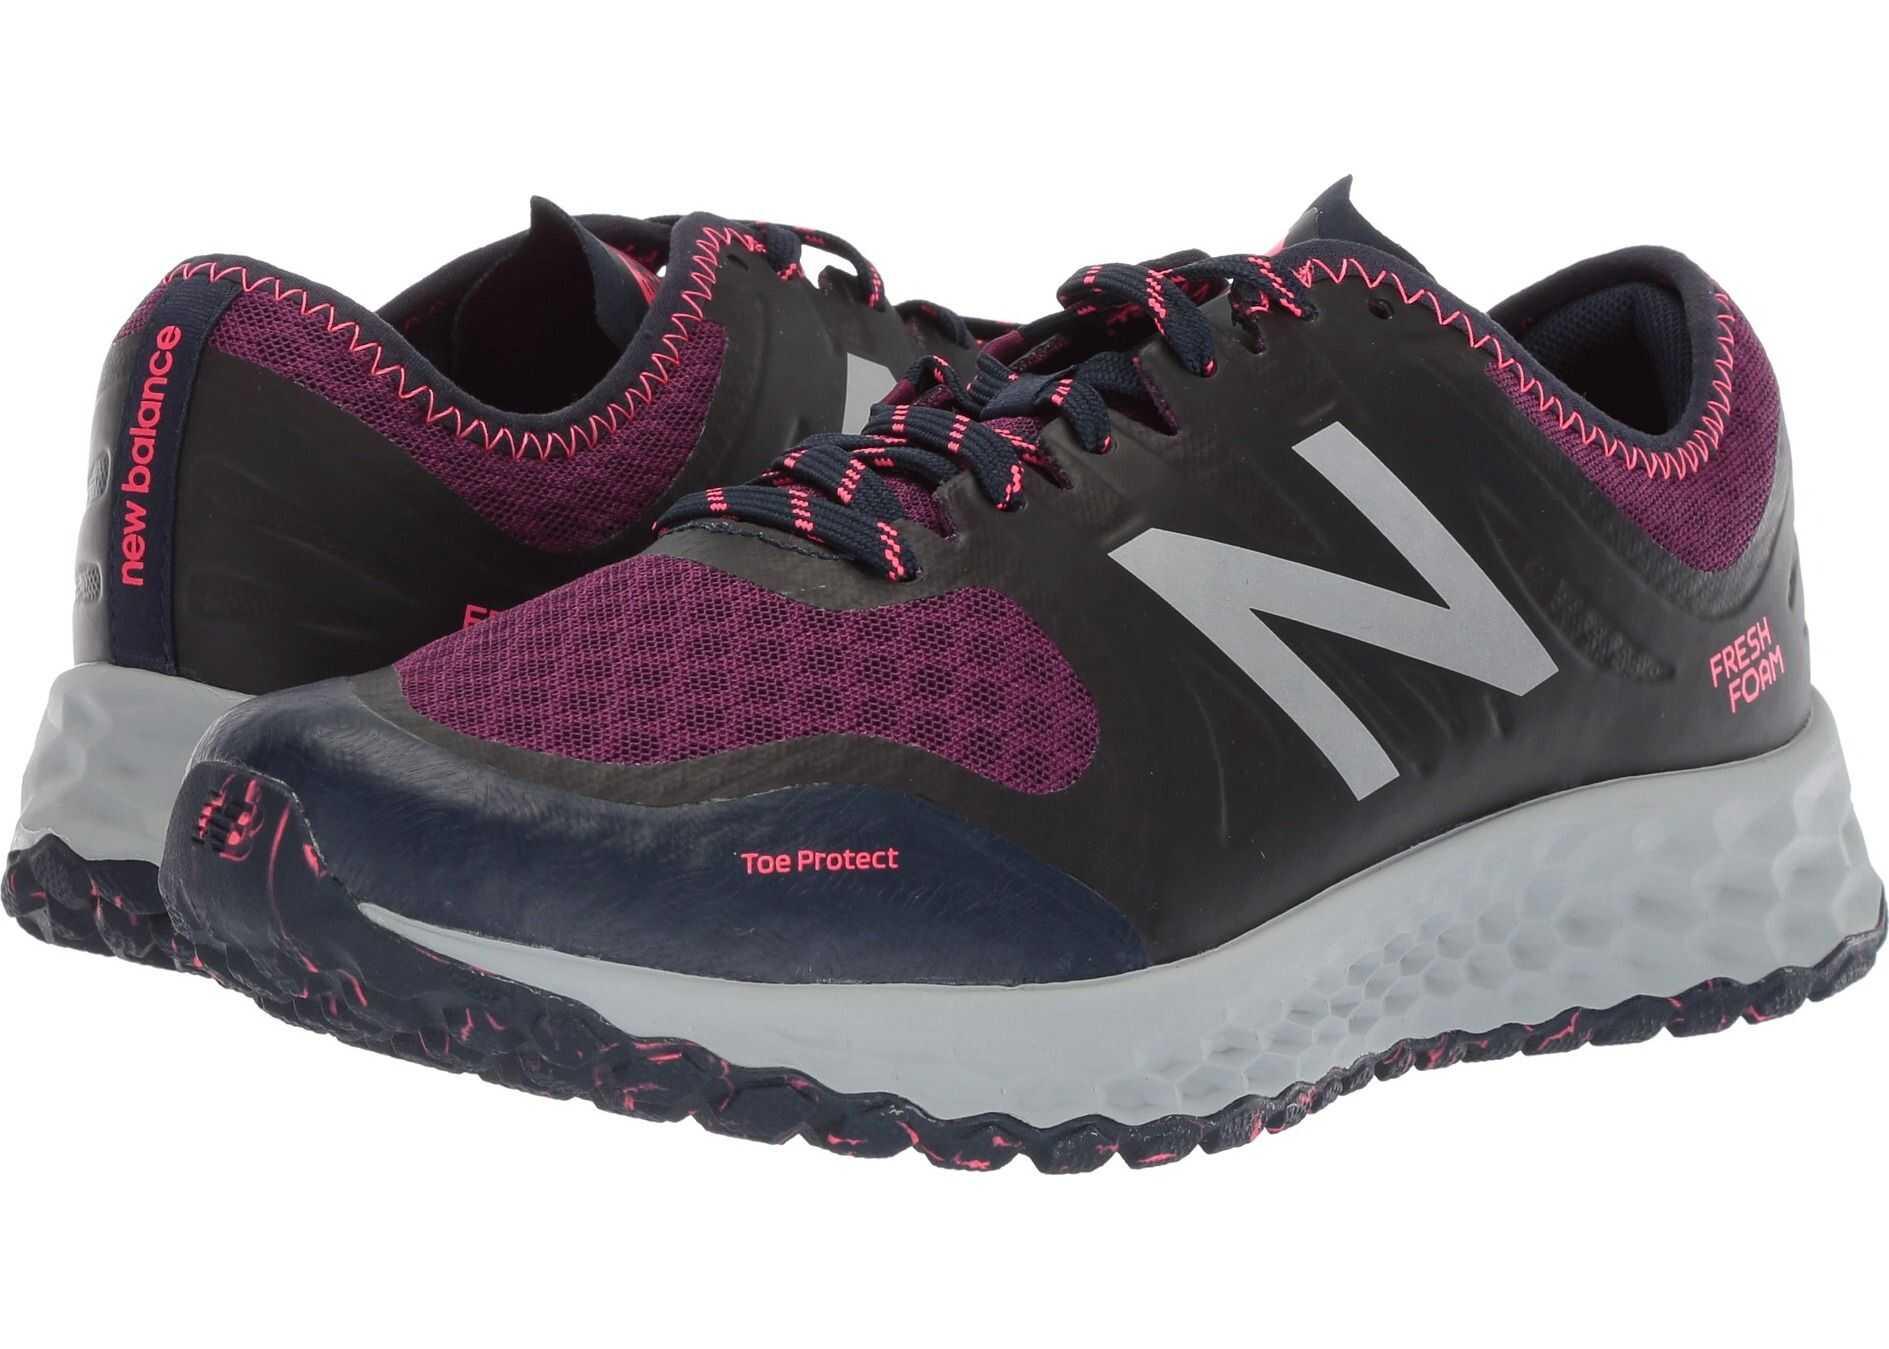 New Balance Kaymin Claret/Pigment/Pink Zing